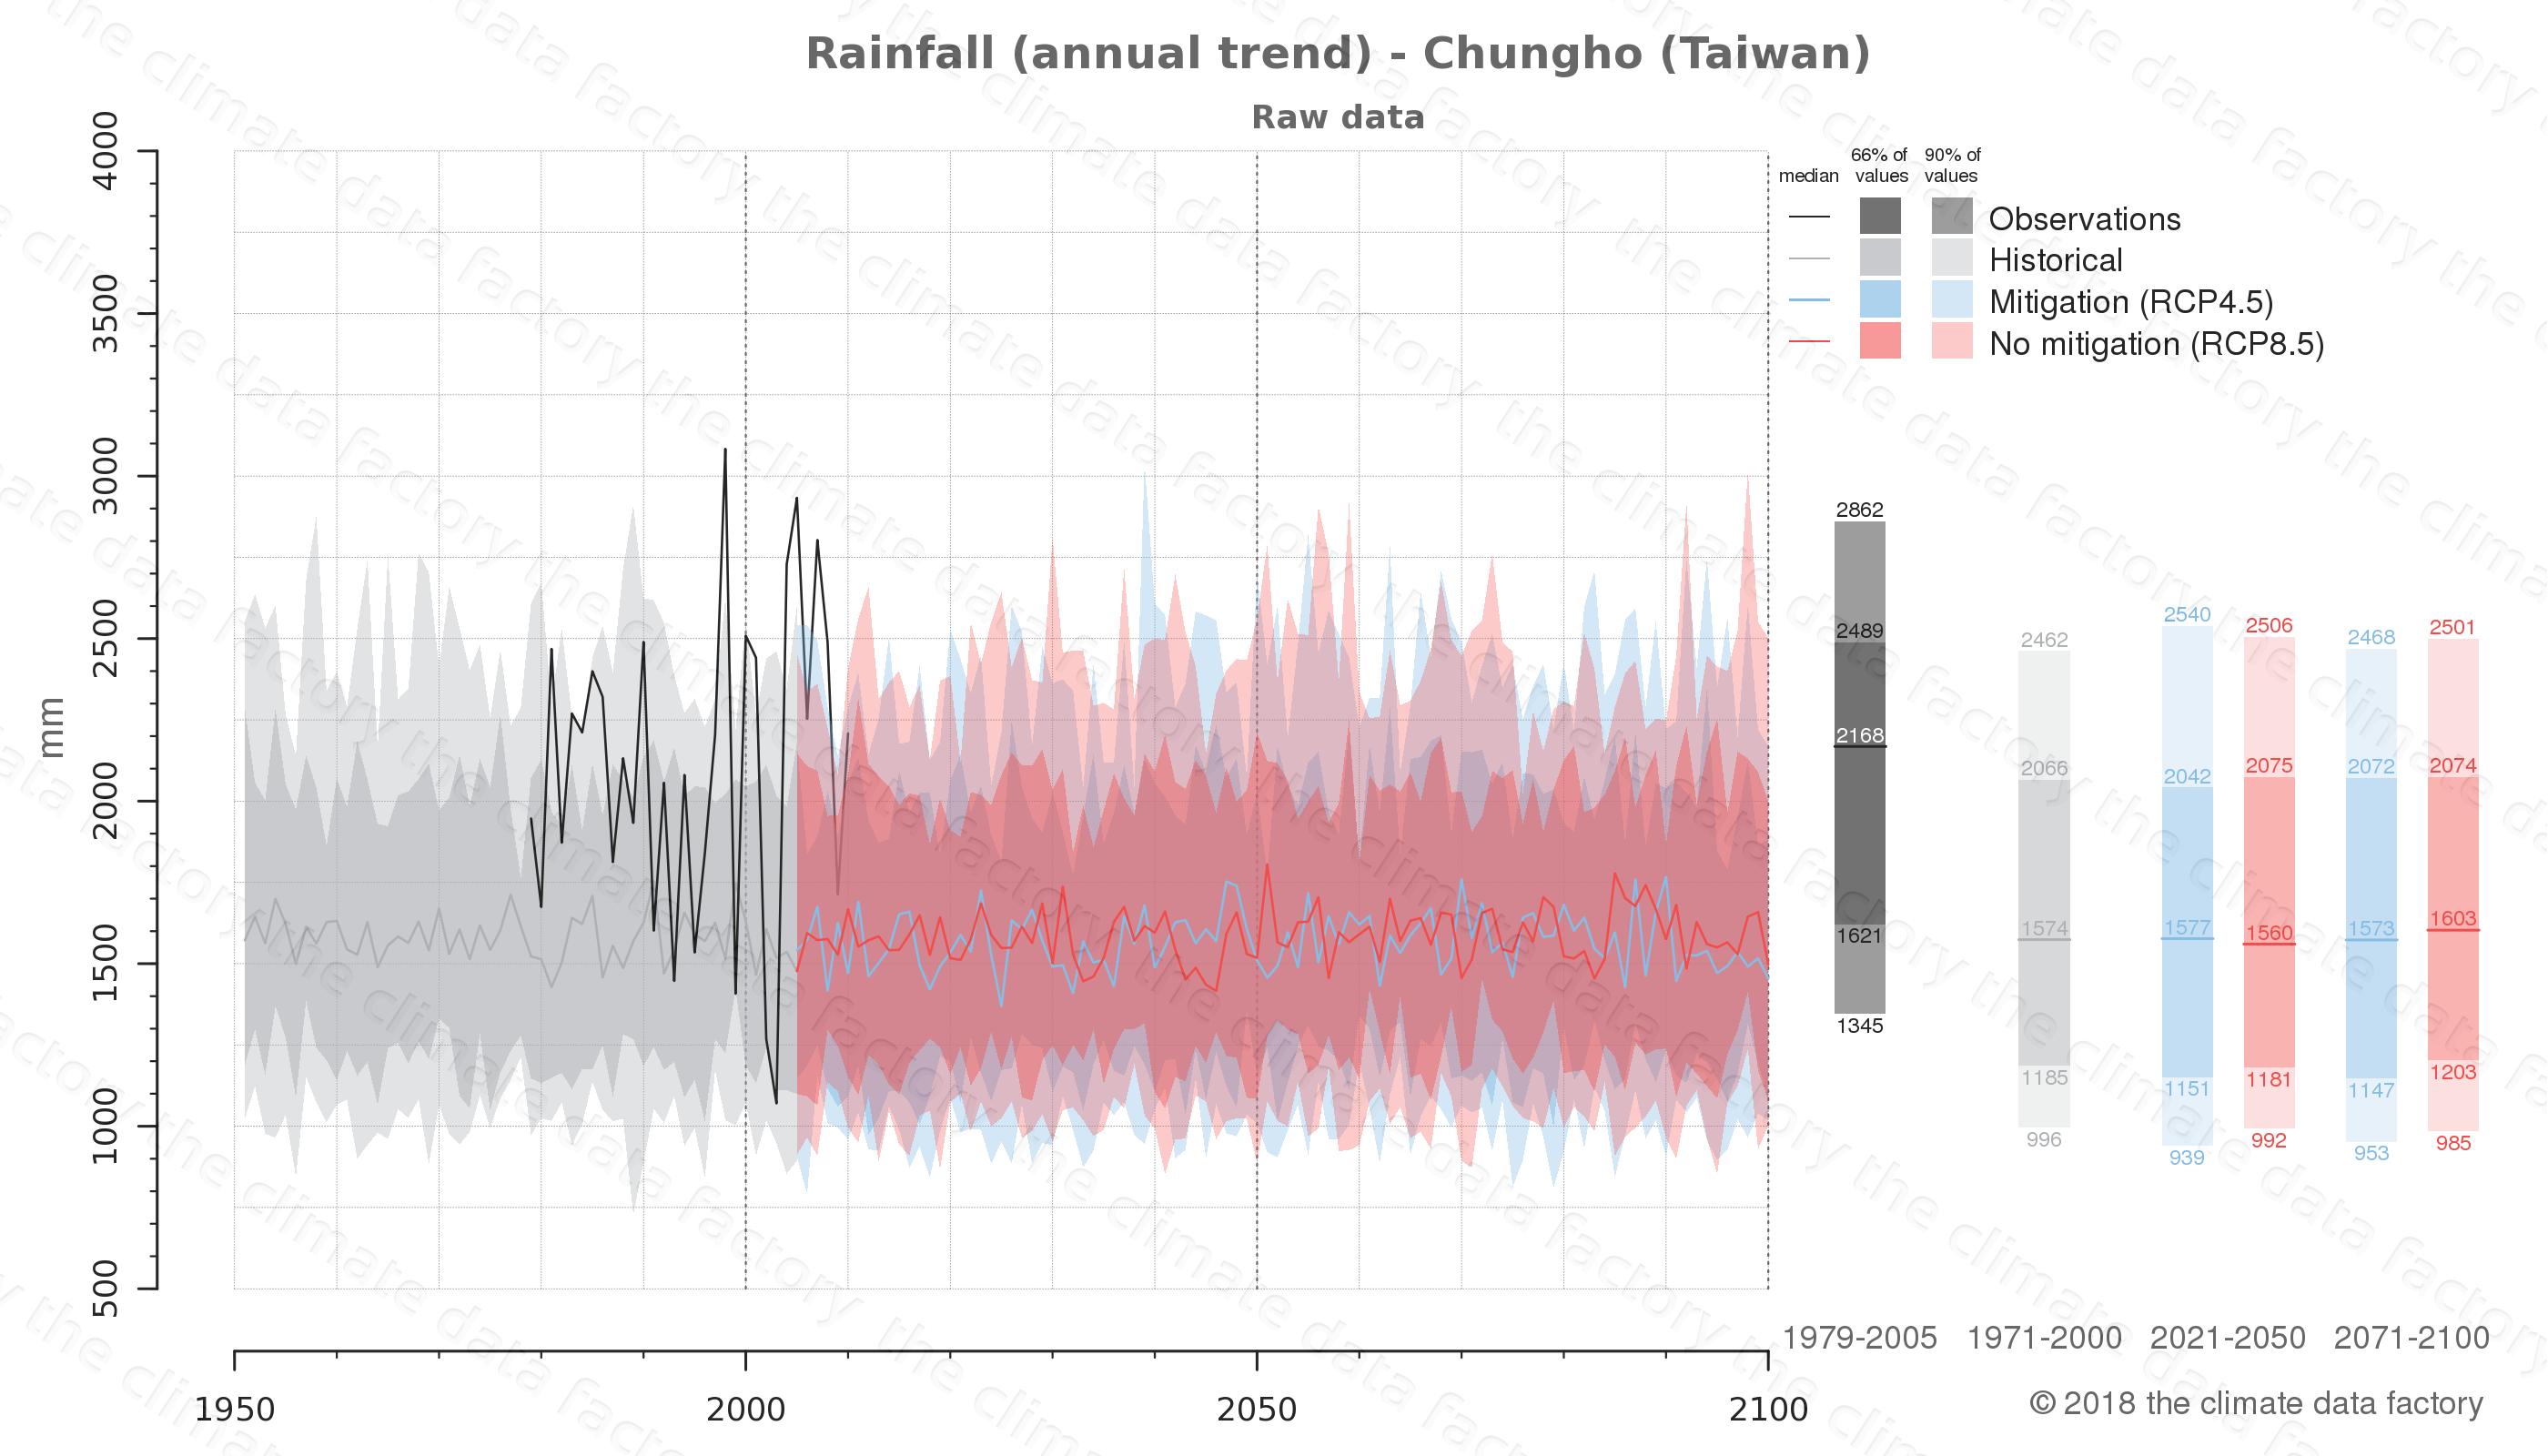 climate change data policy adaptation climate graph city data rainfall chungho taiwan